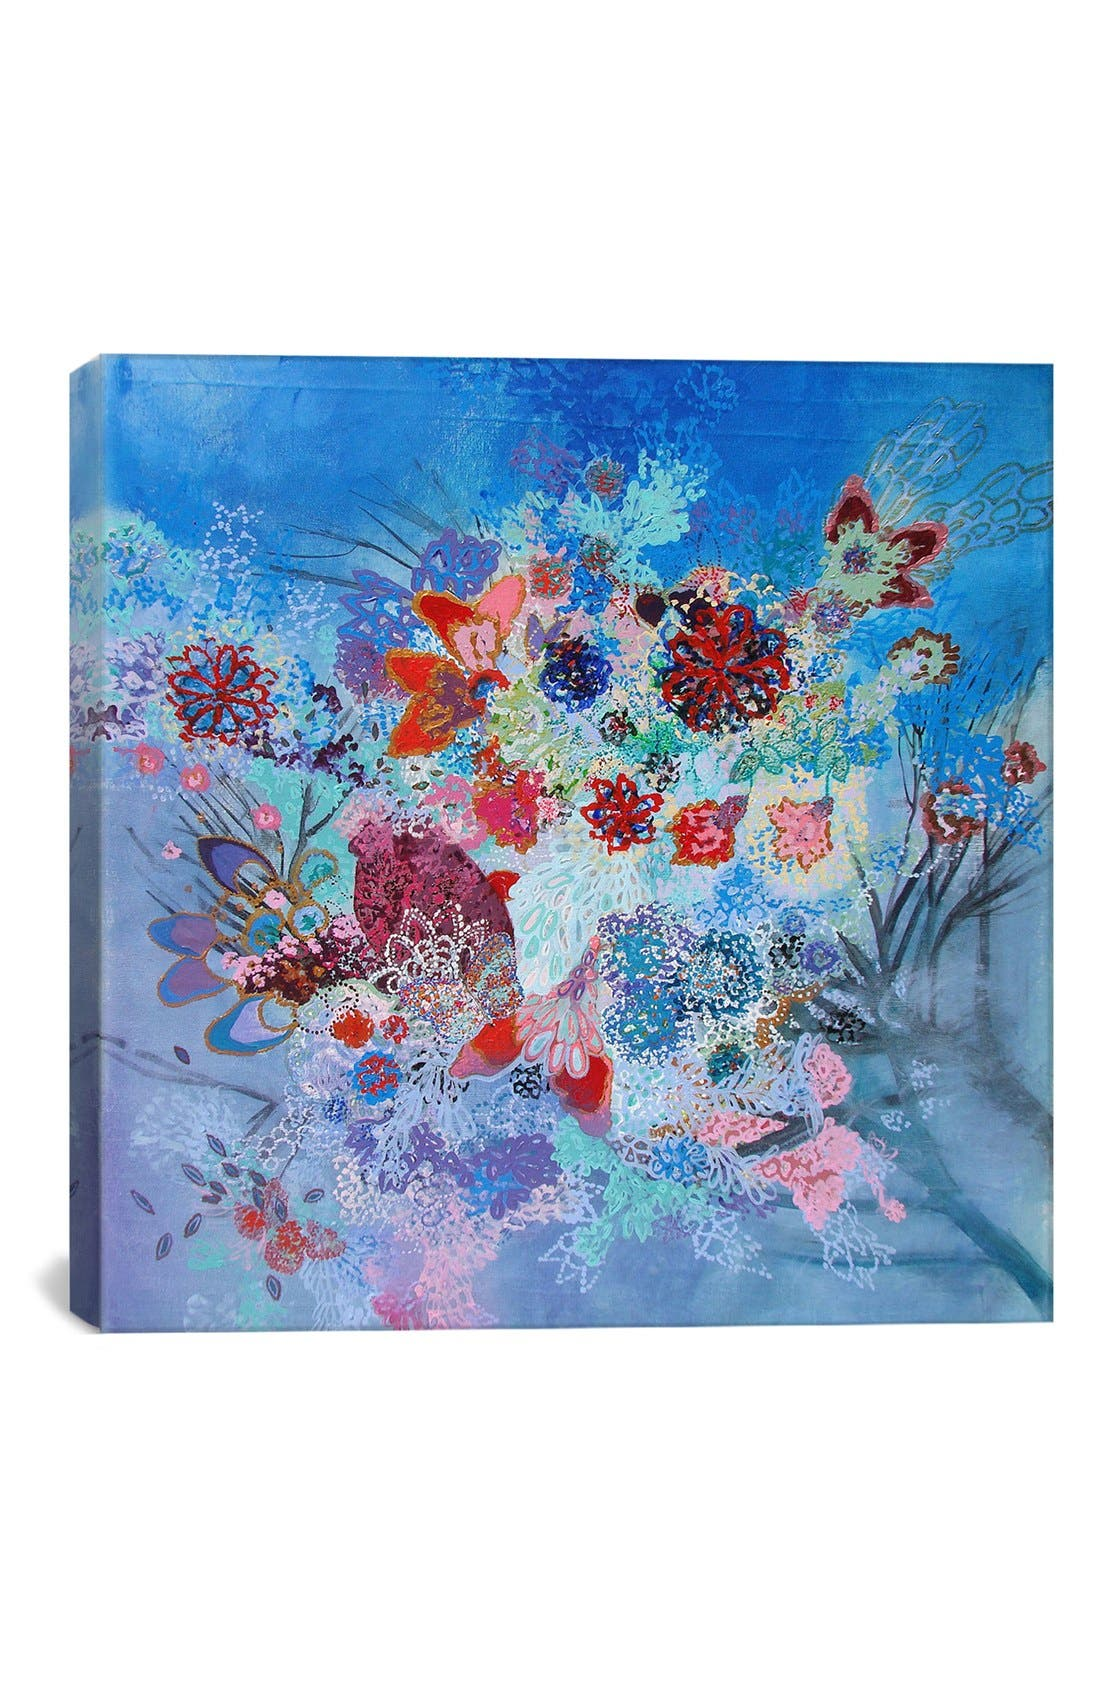 'Flotar en el fondo - Lia Porto' Giclée Print Canvas Art,                         Main,                         color, Blue